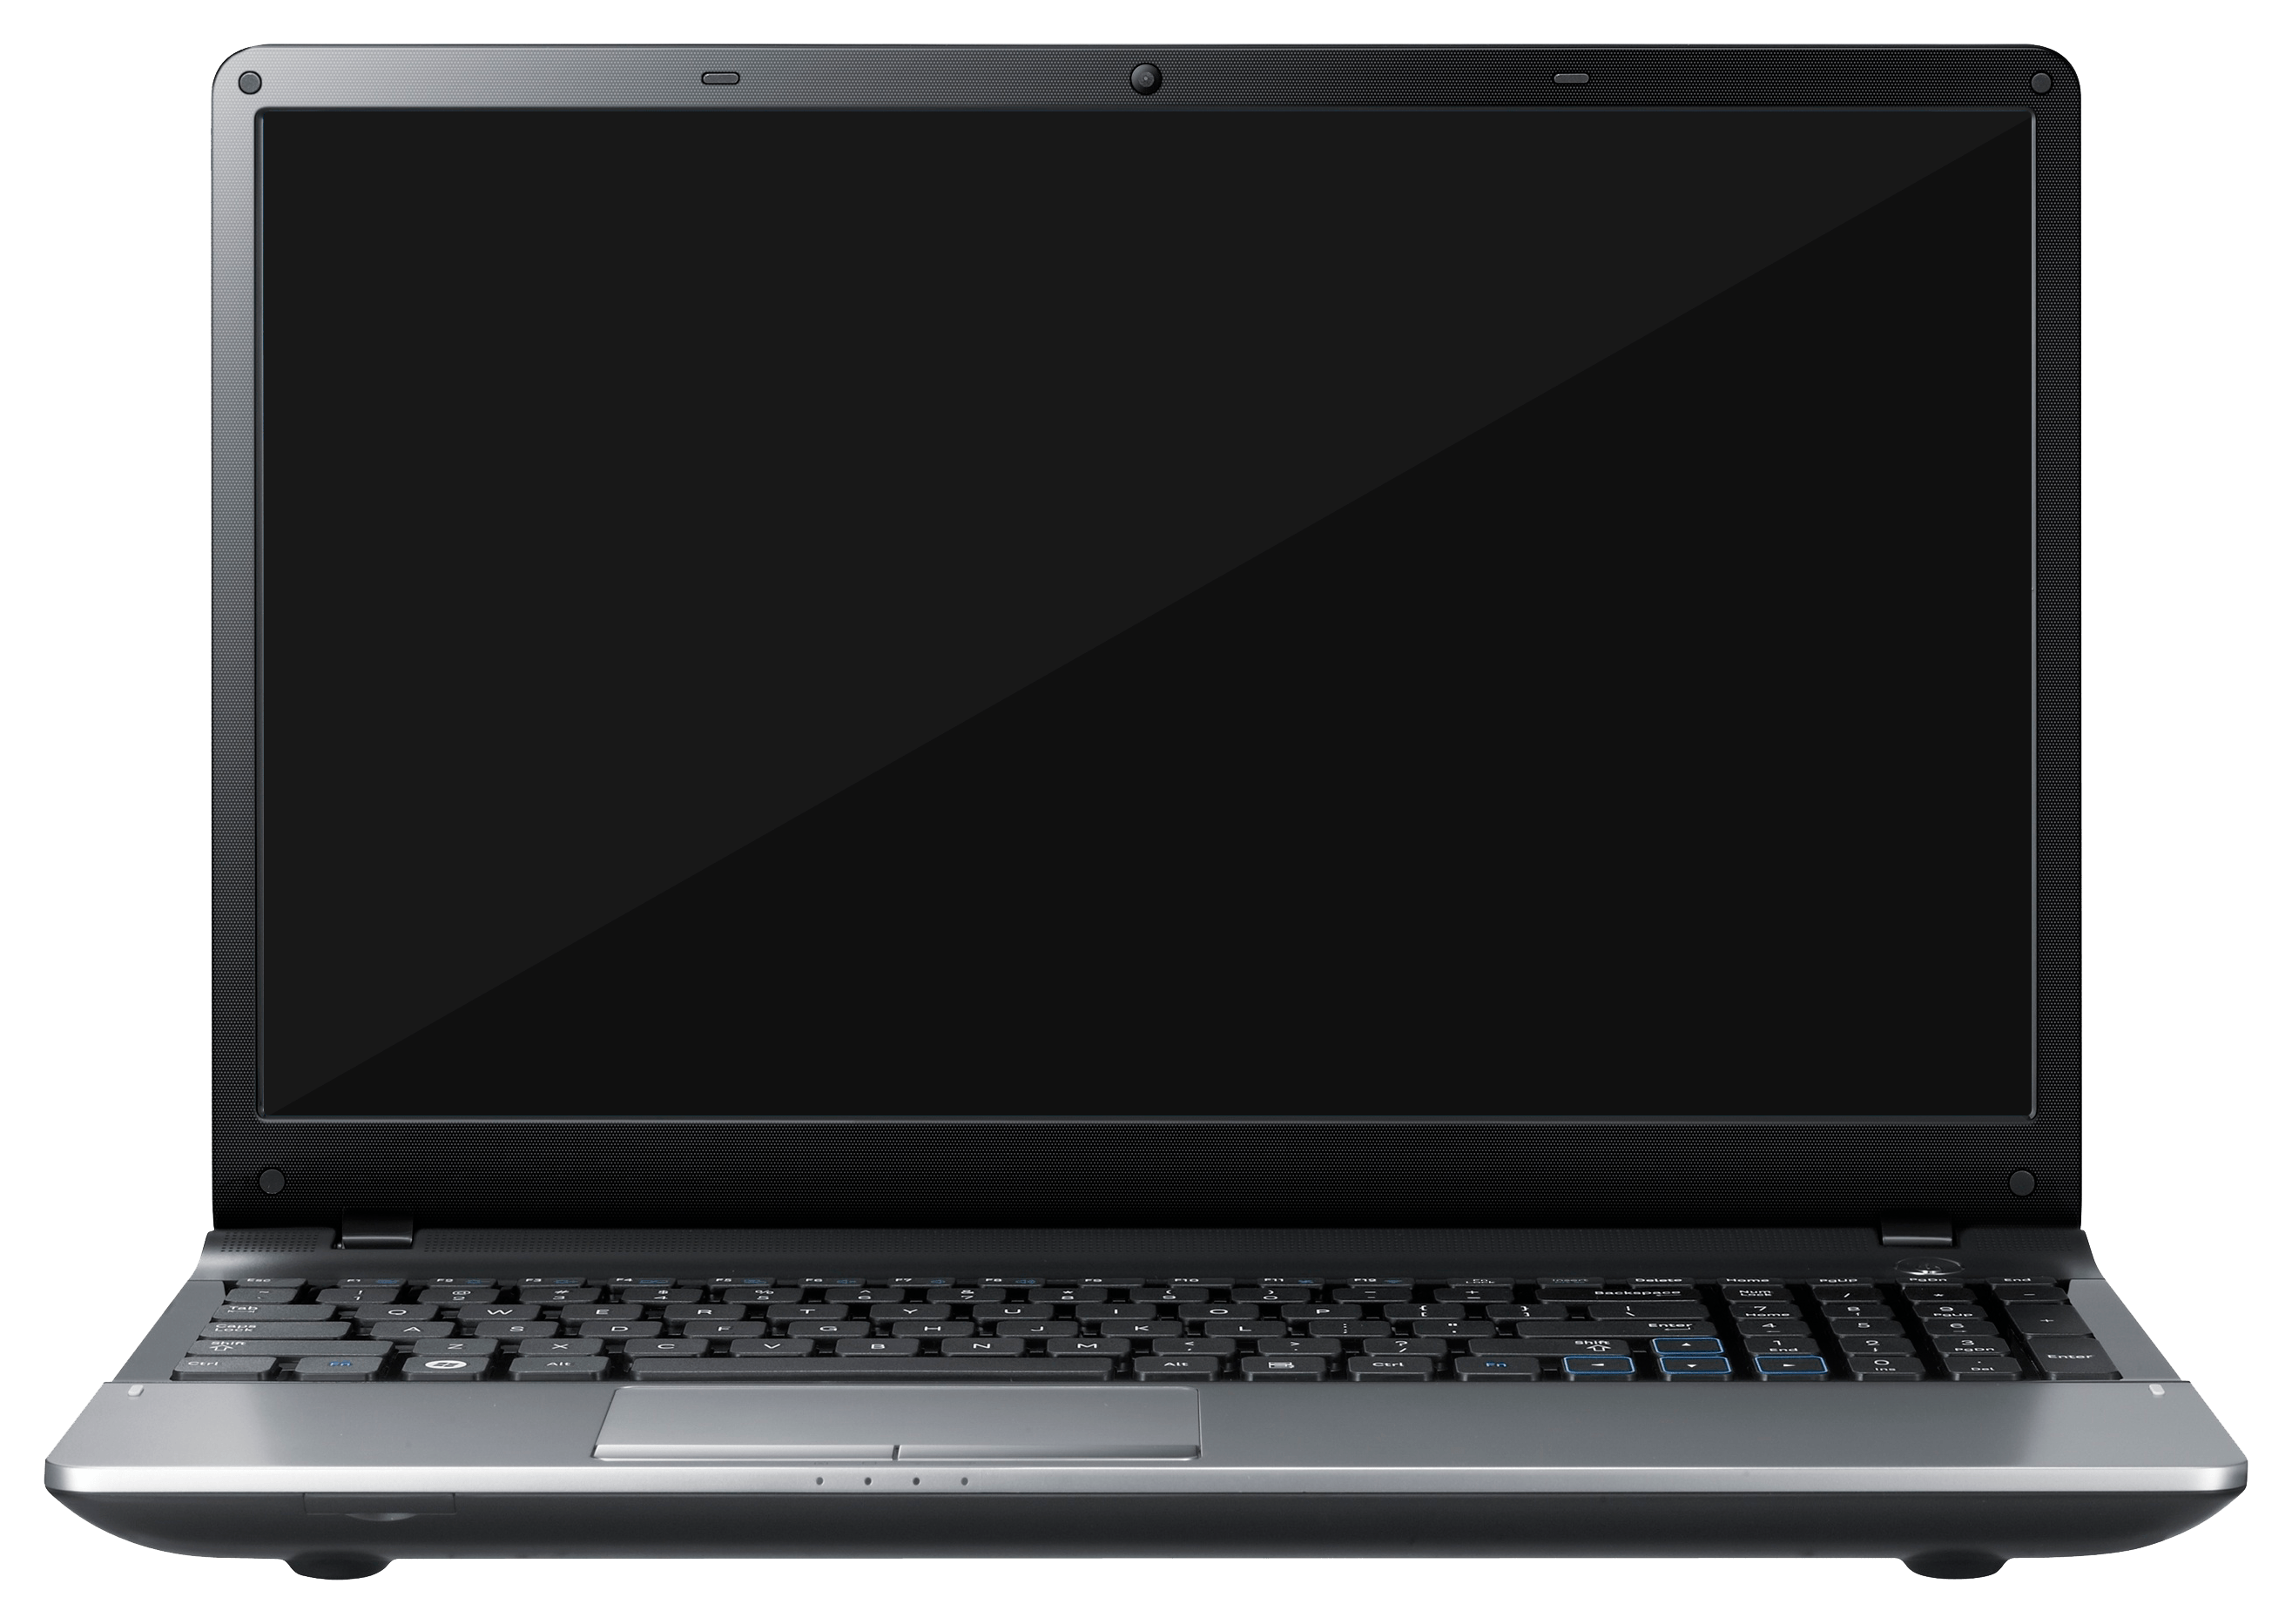 Laptop Notebook Png Image PNG Image - Laptop PNG